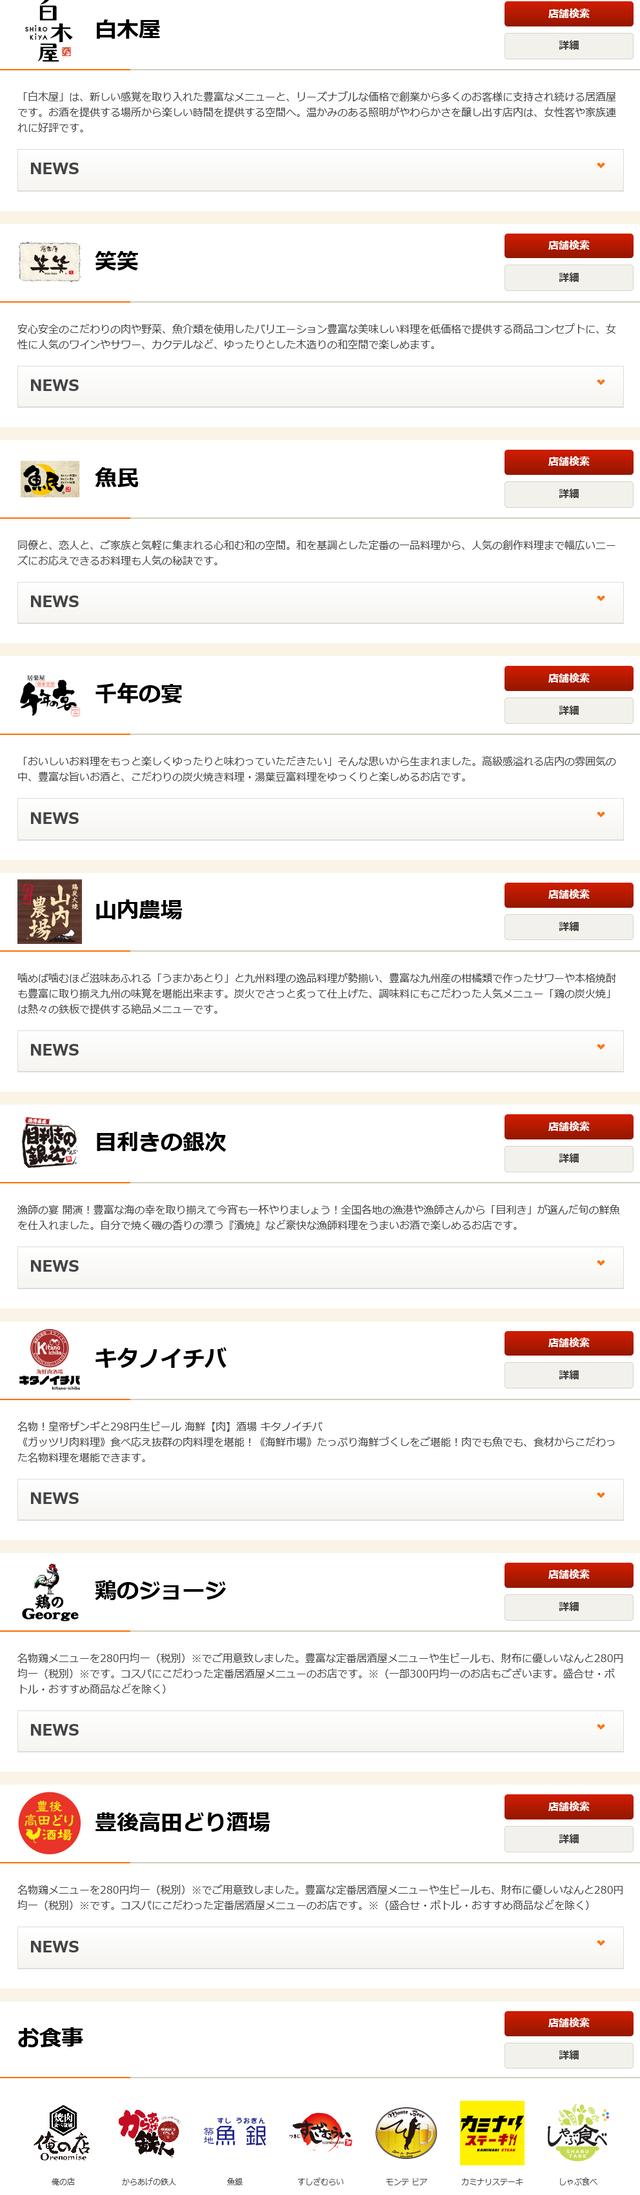 screenshot-www.monteroza.co.jp-2021.01.15-15_24_52